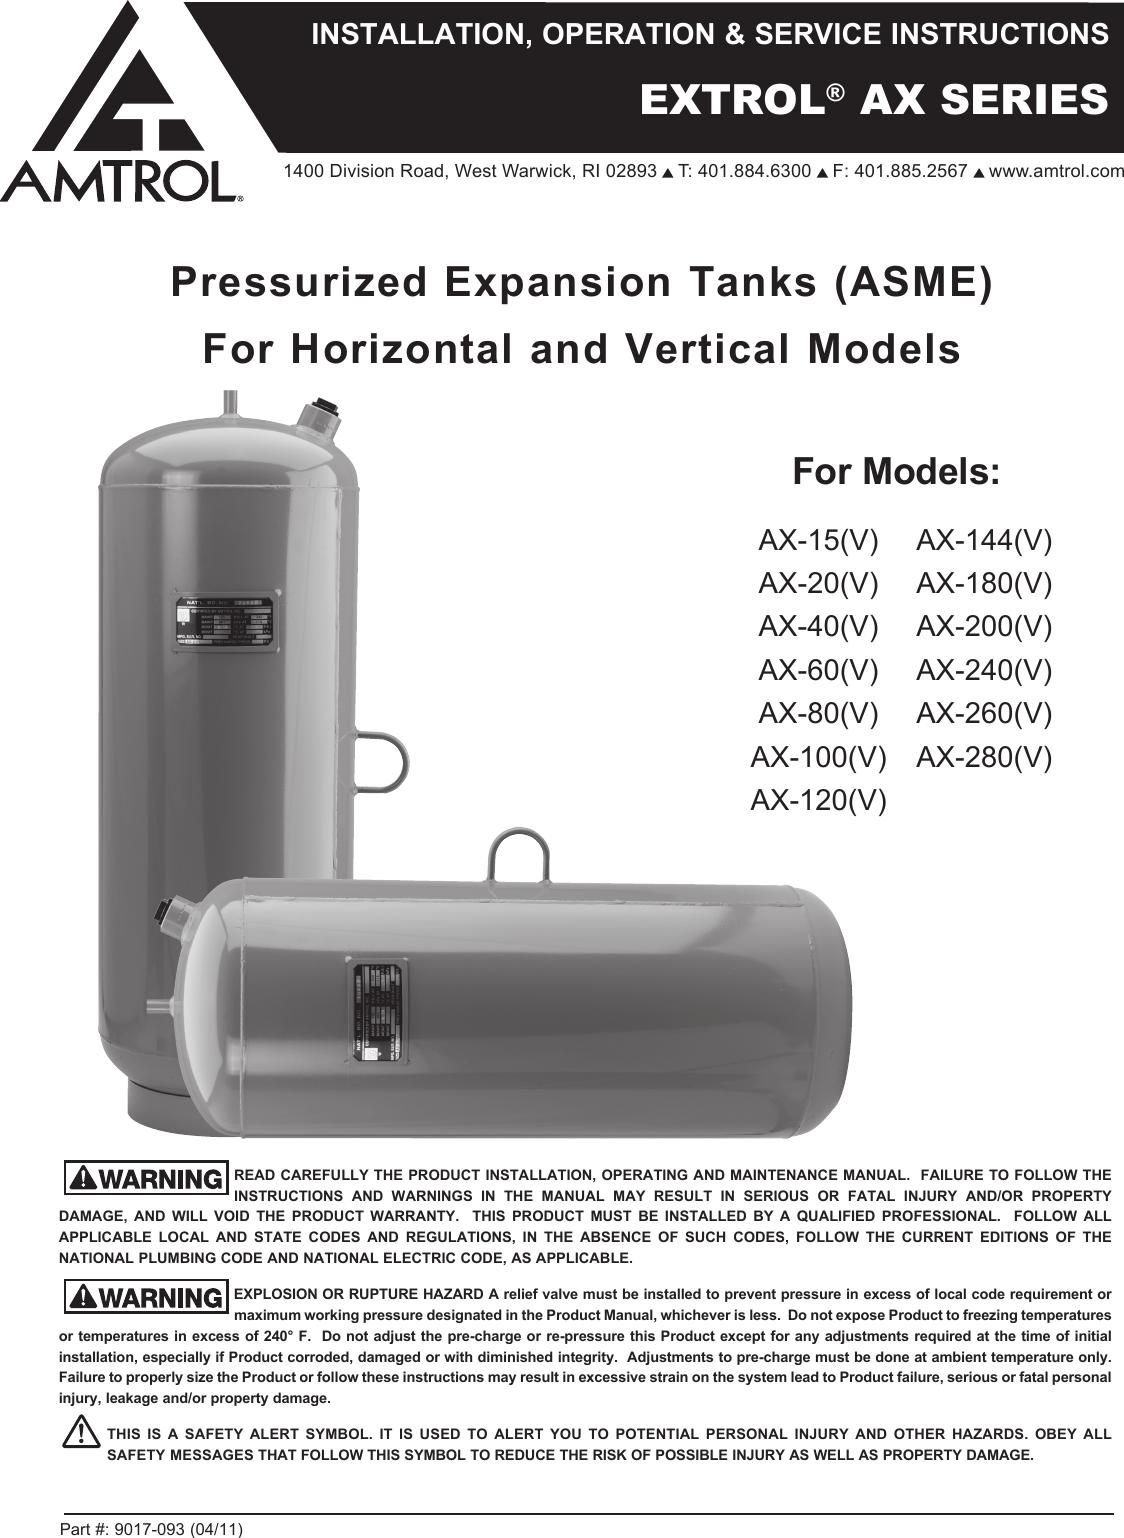 Amtrol Extrol Ax 100V Users Manual 9017 093 04_11 IO